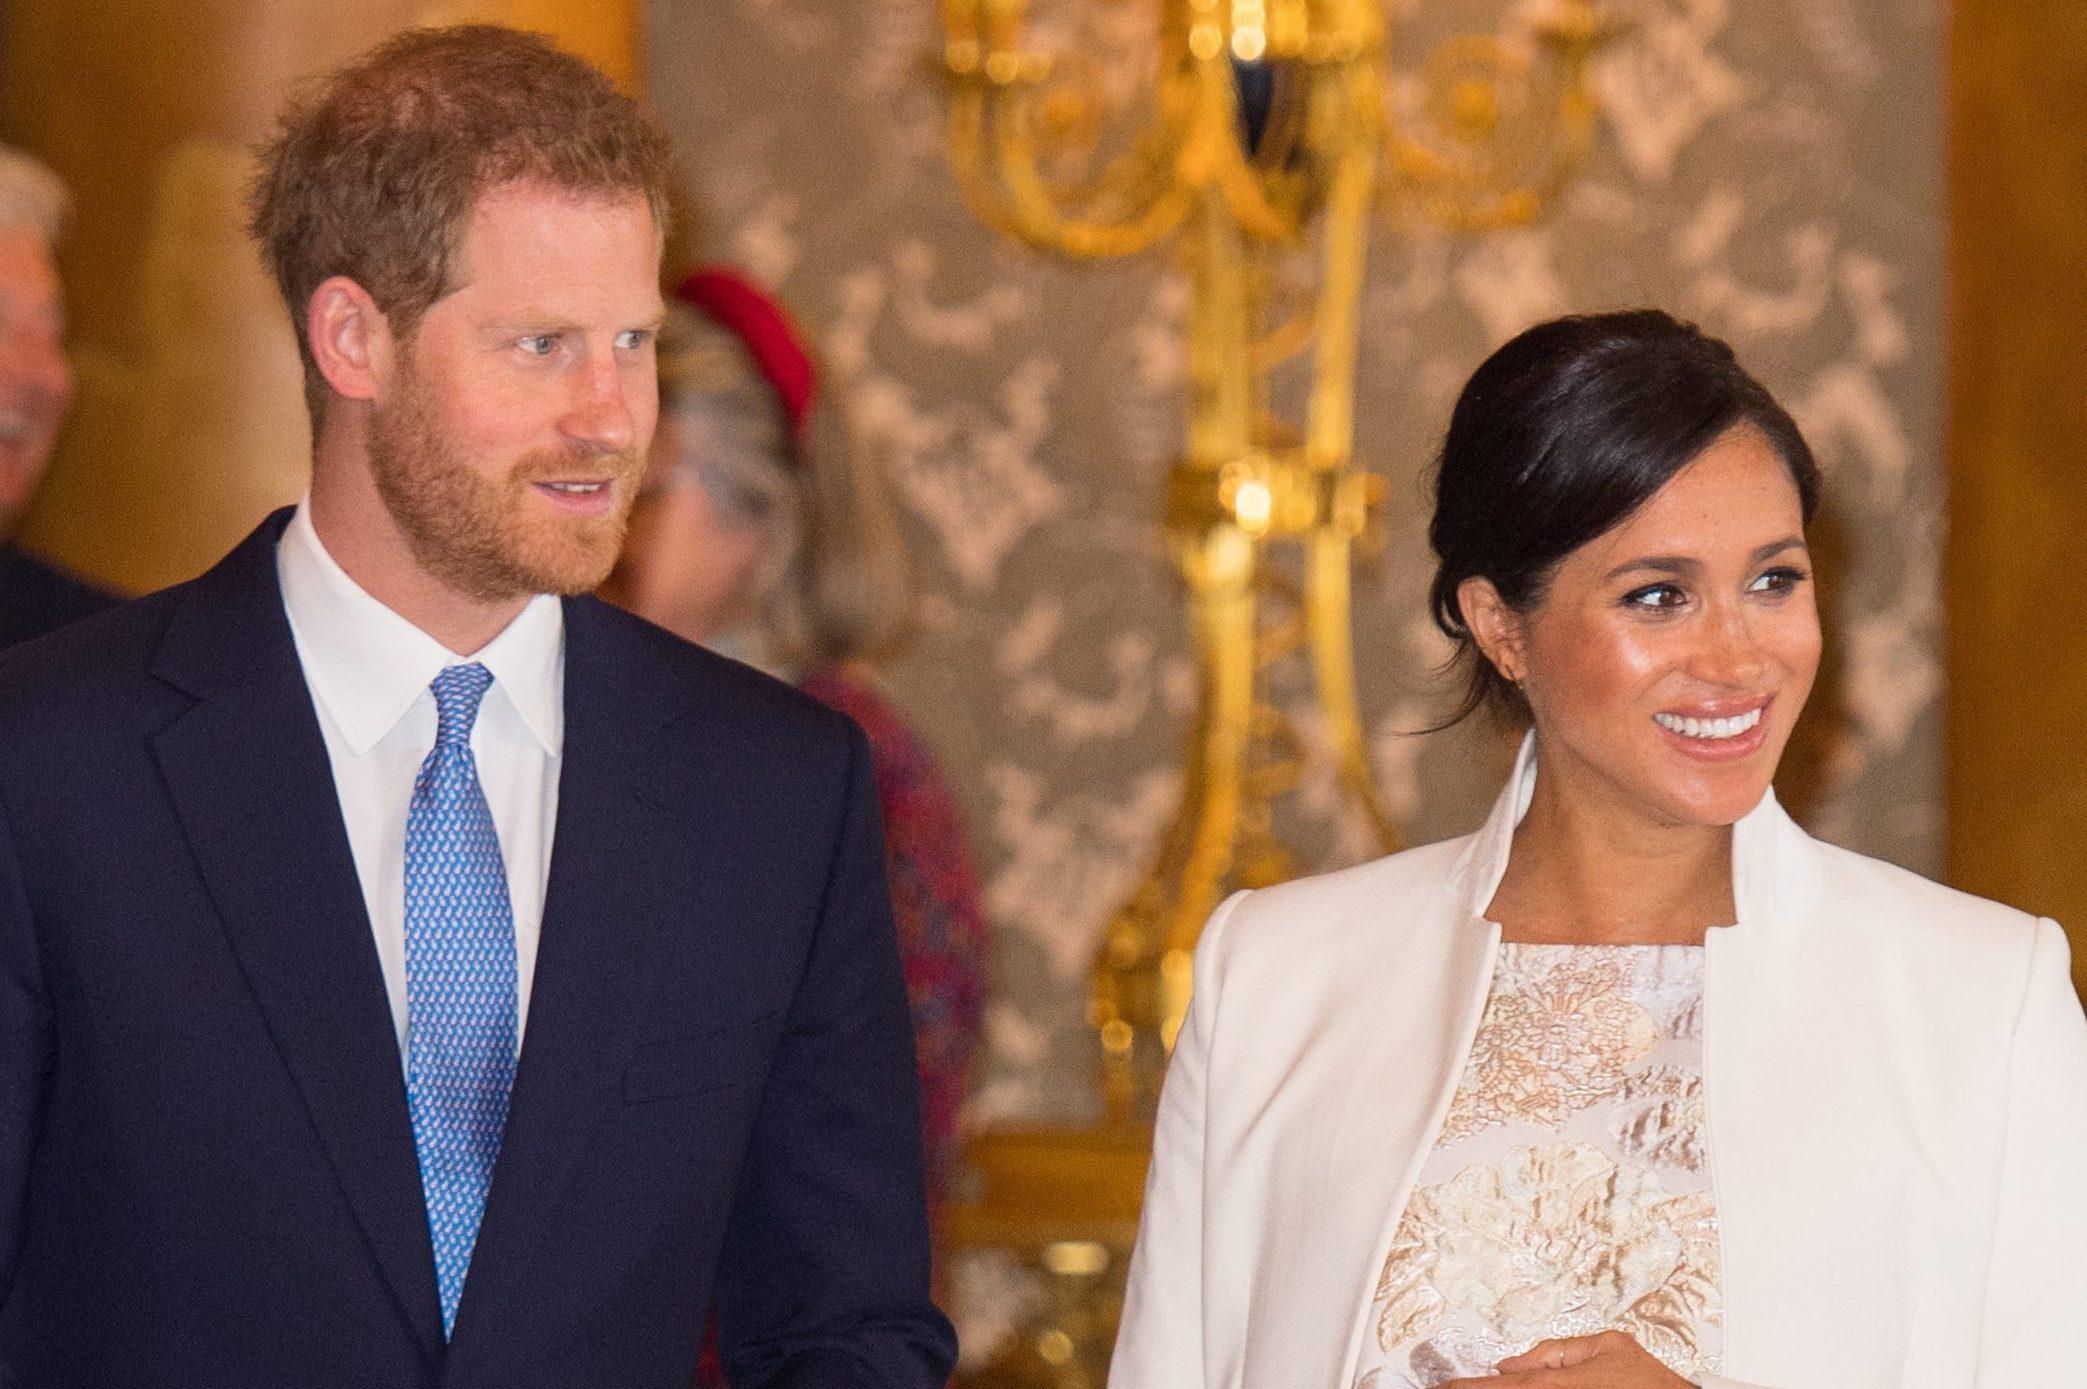 Meghan Markle prepara la cameretta del Royal Baby: ecco quanto ha speso per arredarla